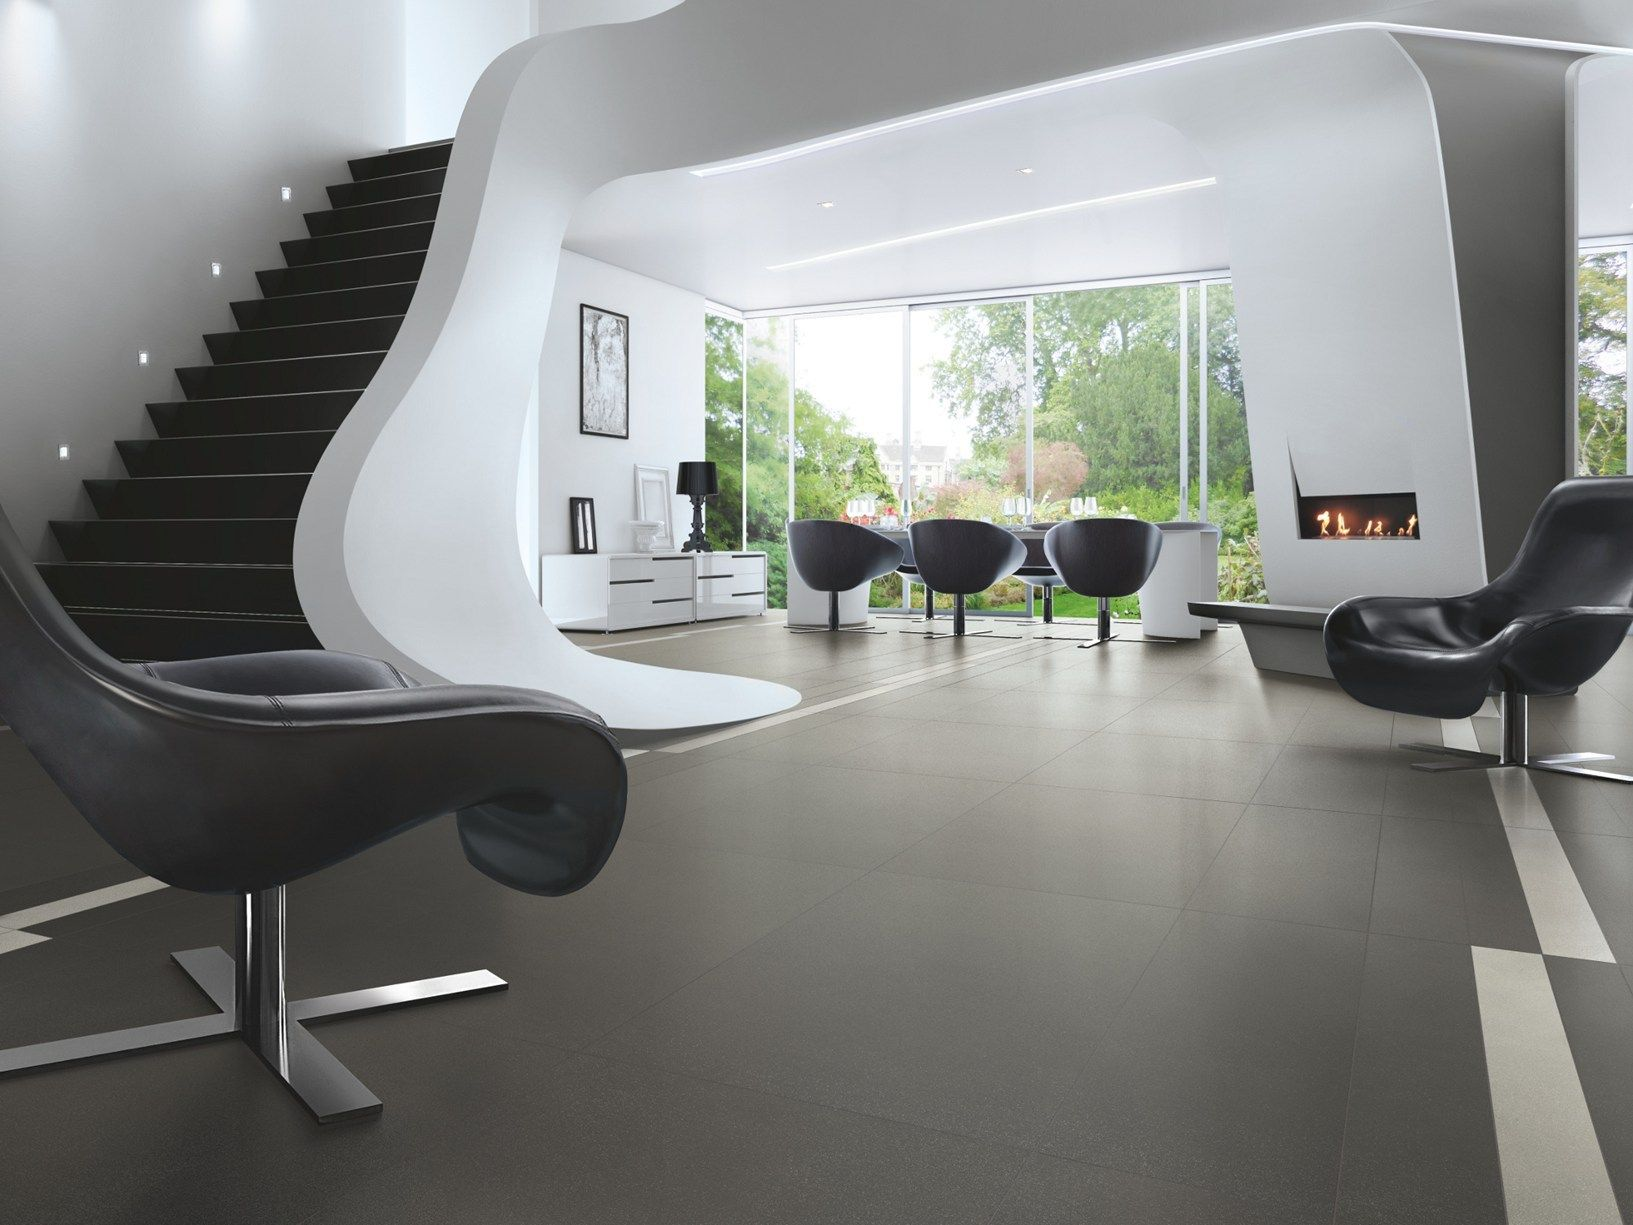 Casalgrande Padana partner of Pinifarina Home Design